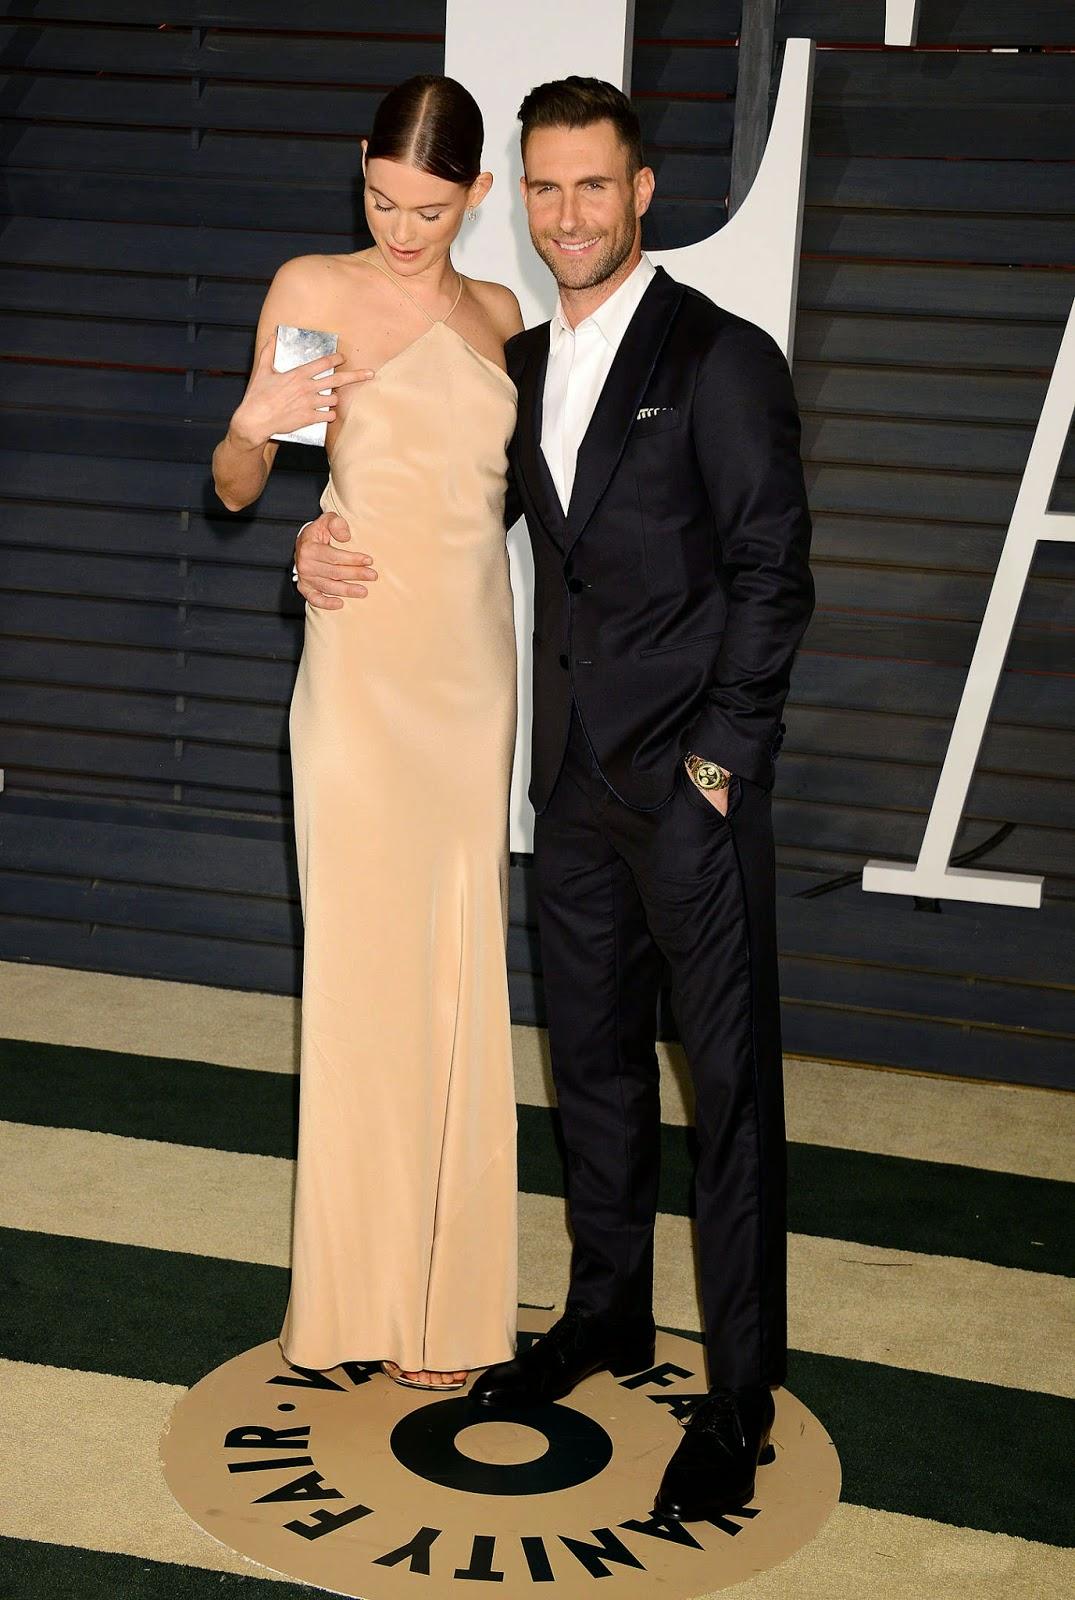 Behati Prinsloo suffers nip-slip at the 2015 Vanity Fairs Oscars Party in Hollywood